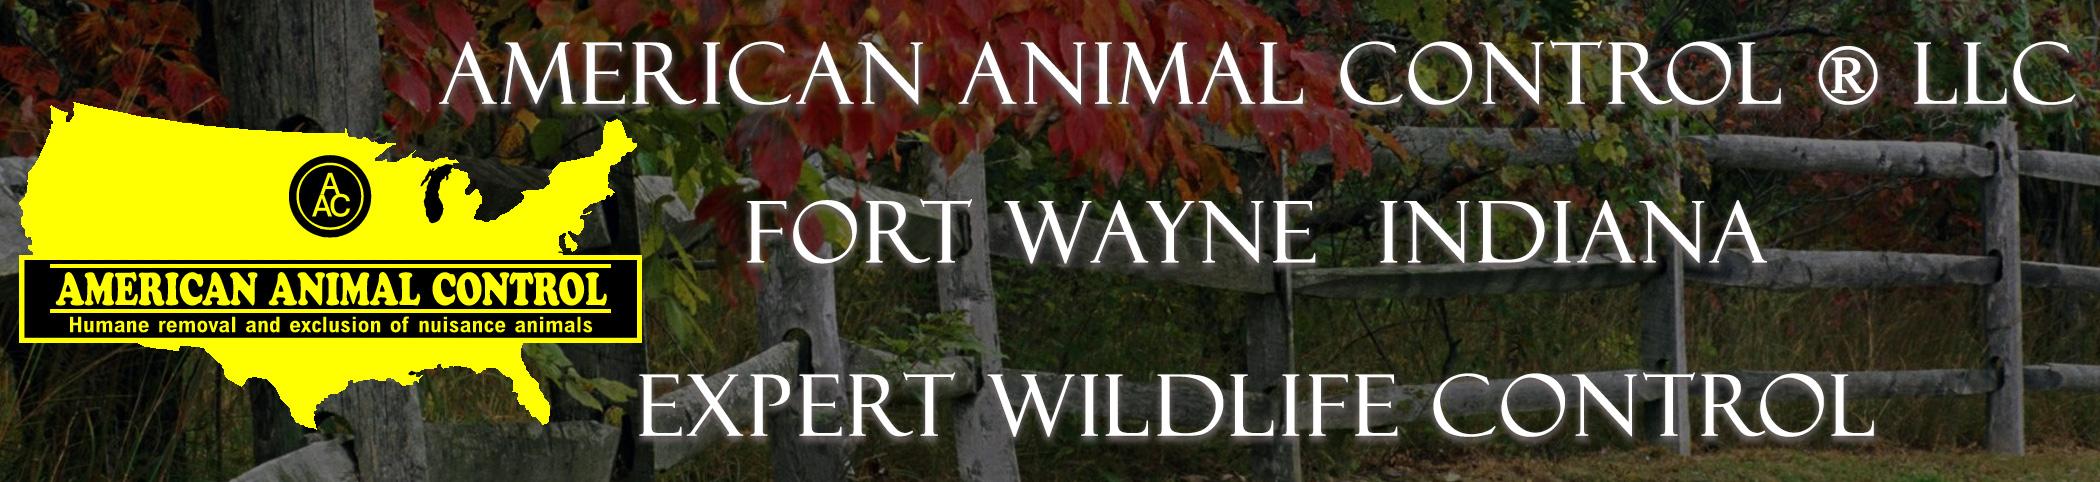 Fort Wayne Wildlife Control